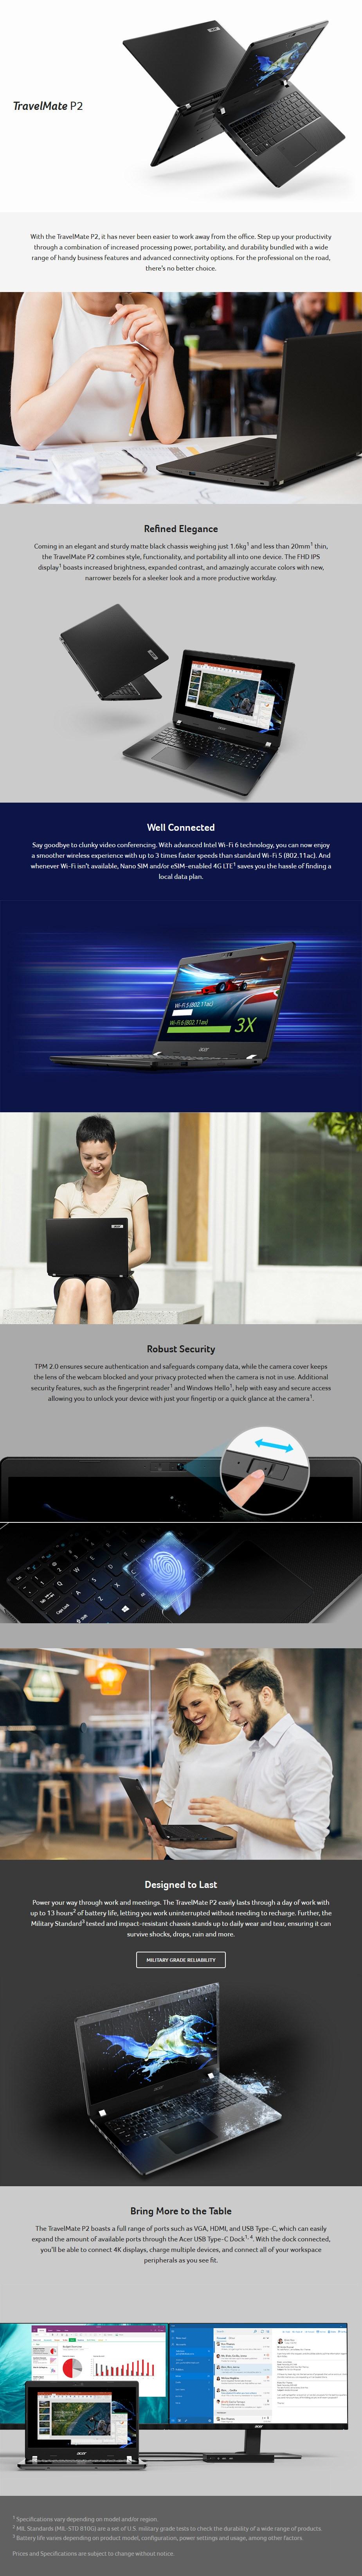 acer-travelmate-p214-14-laptop-i710510u-8gb-512gb-ssd-win10-pro-ac37410-1.jpg